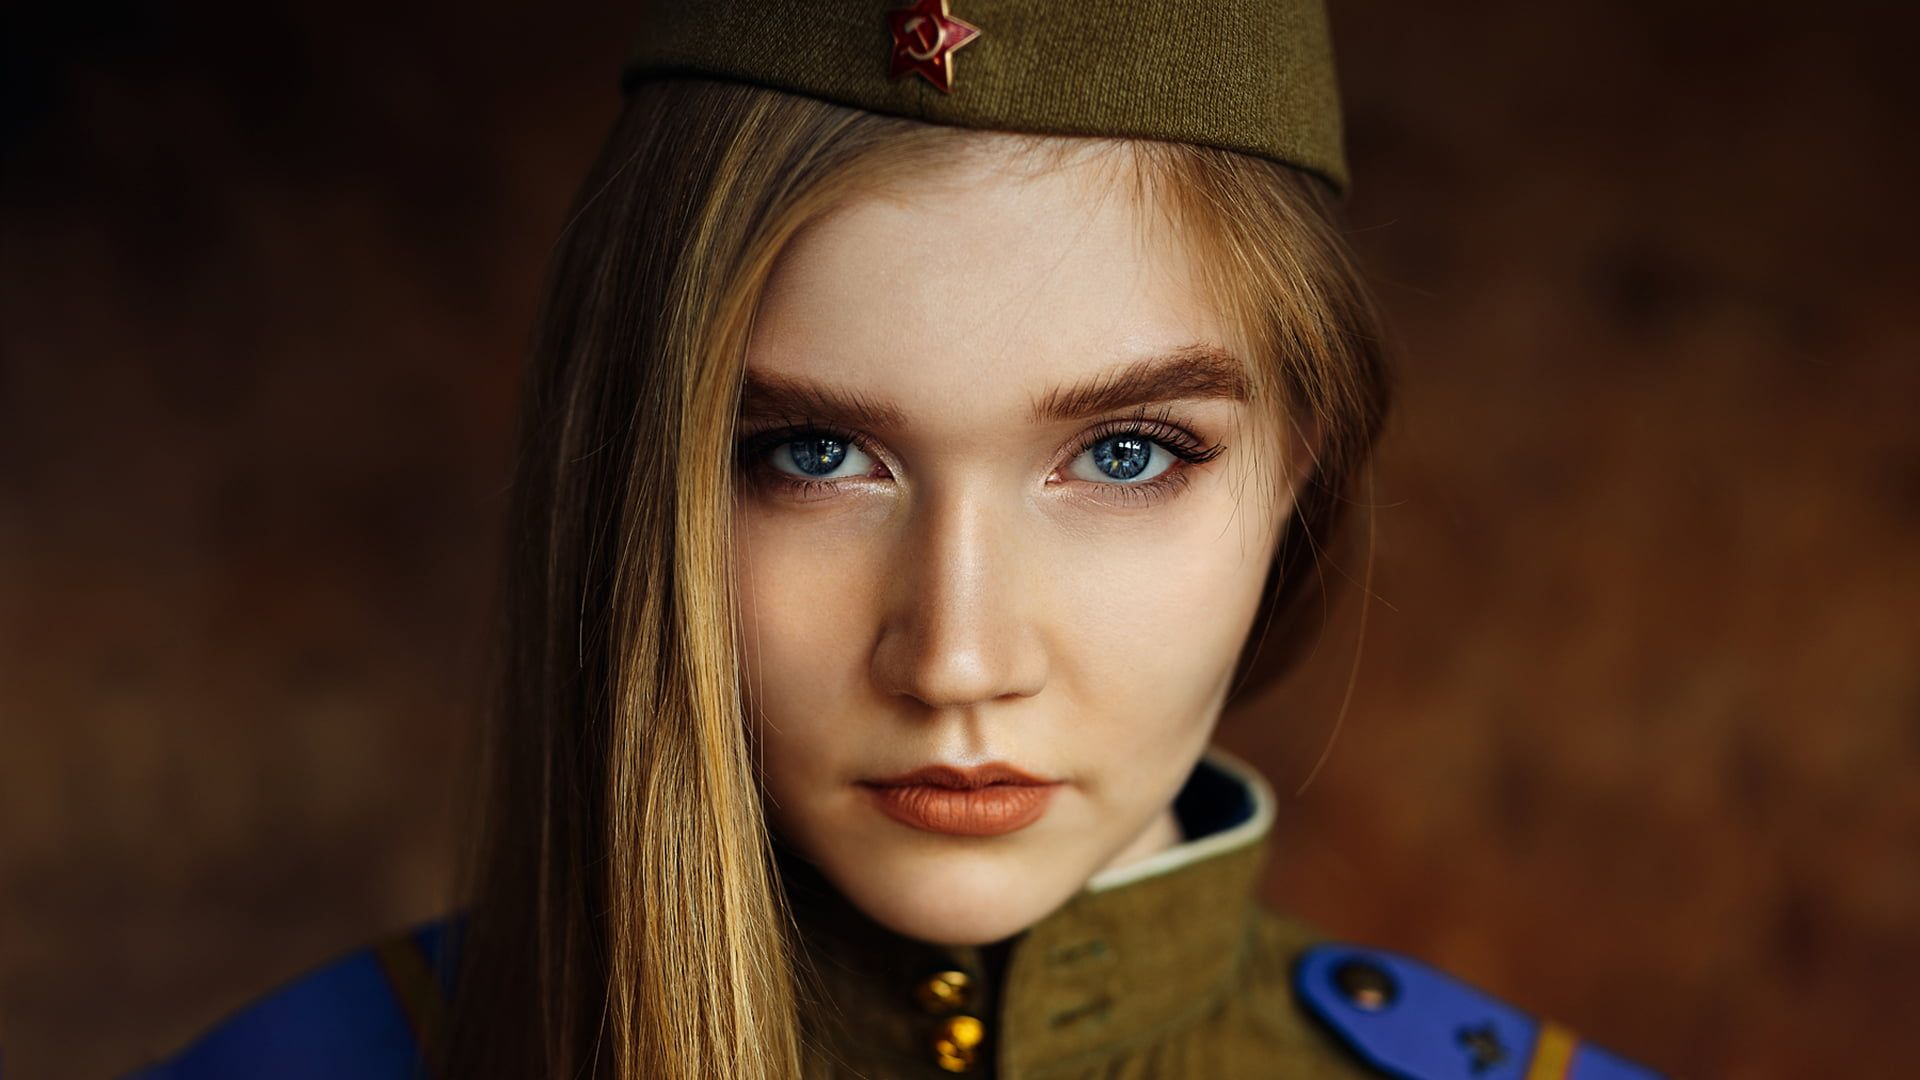 Women Blonde Face Portrait Blue Eyes Hammer And Sickle Soviet Union Uniform 1080p Wallpaper Hdwallpaper Desktop Blue Eyes Hammer And Sickle Portrait Hammer and sickle hd wallpaper